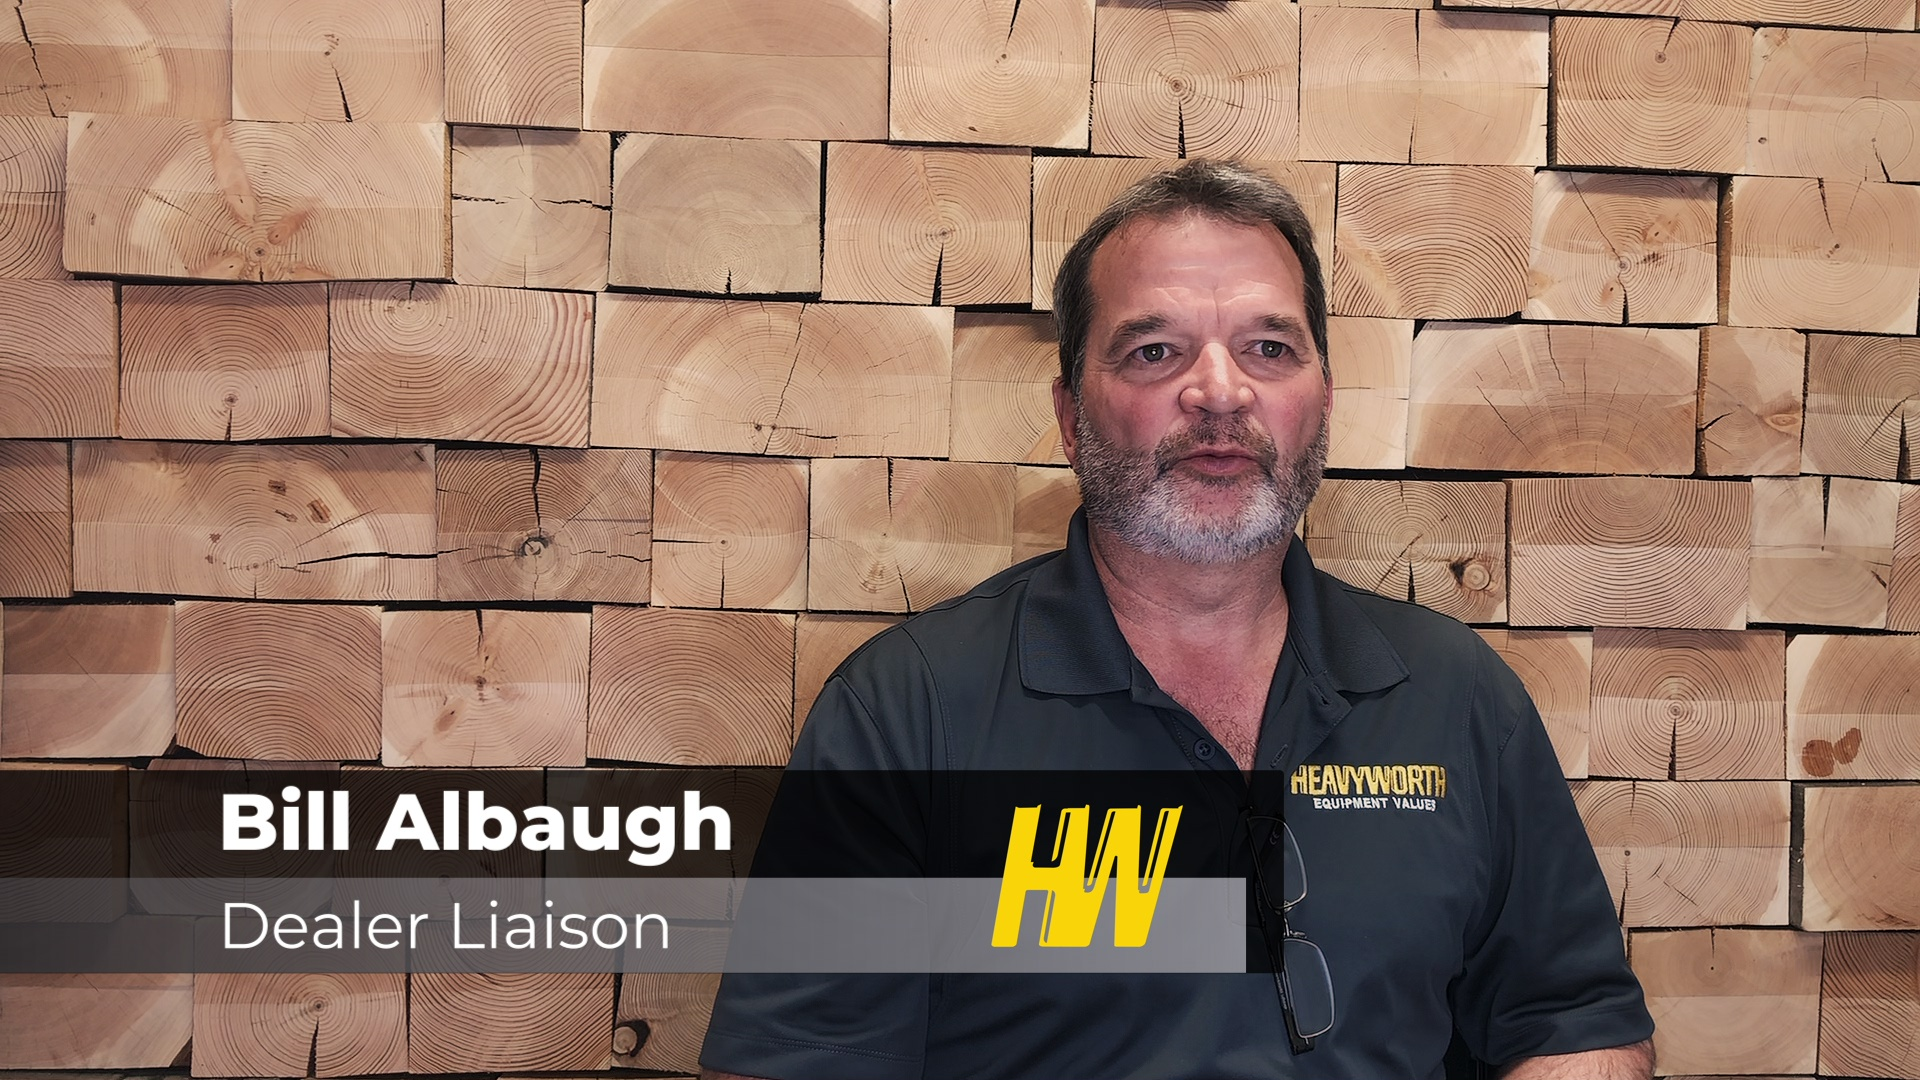 Bill Albaugh explains specialized equipment values